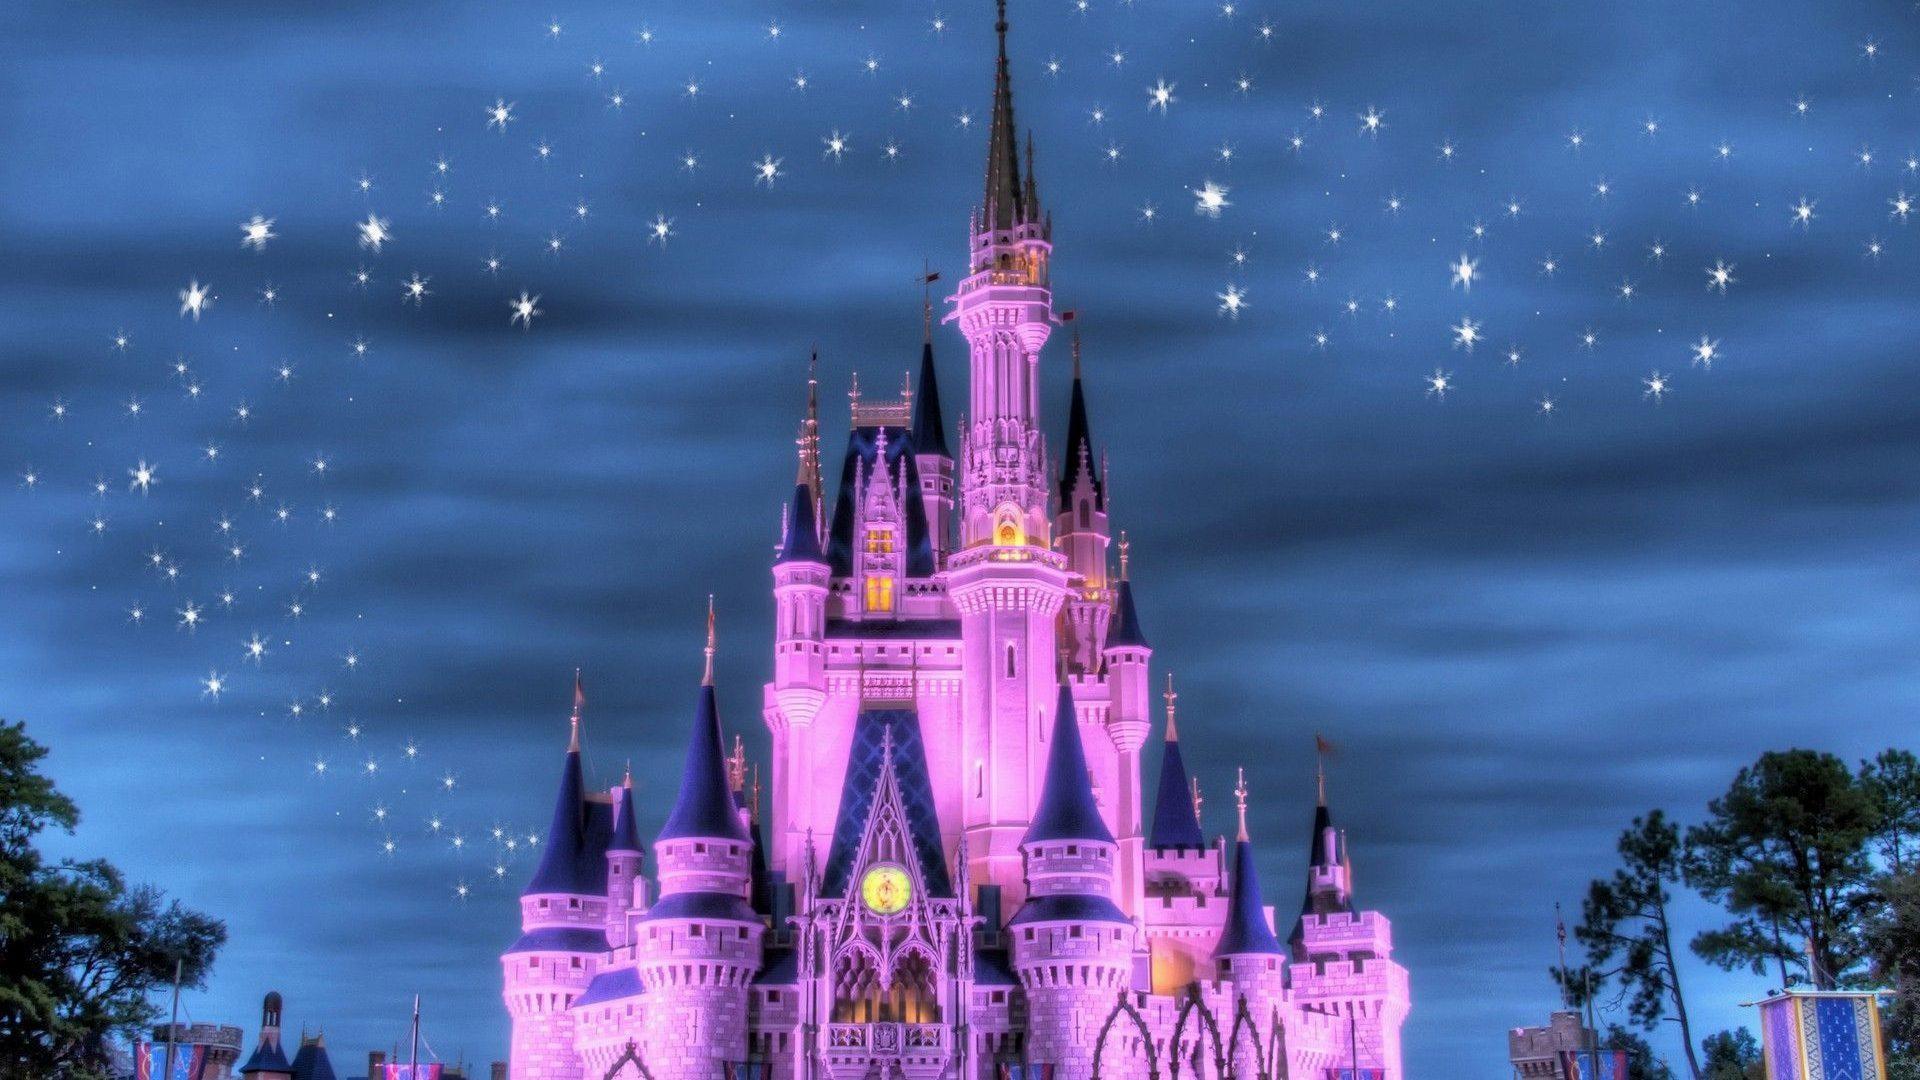 Disney Cinderella Wallpaper -① WallpaperTag